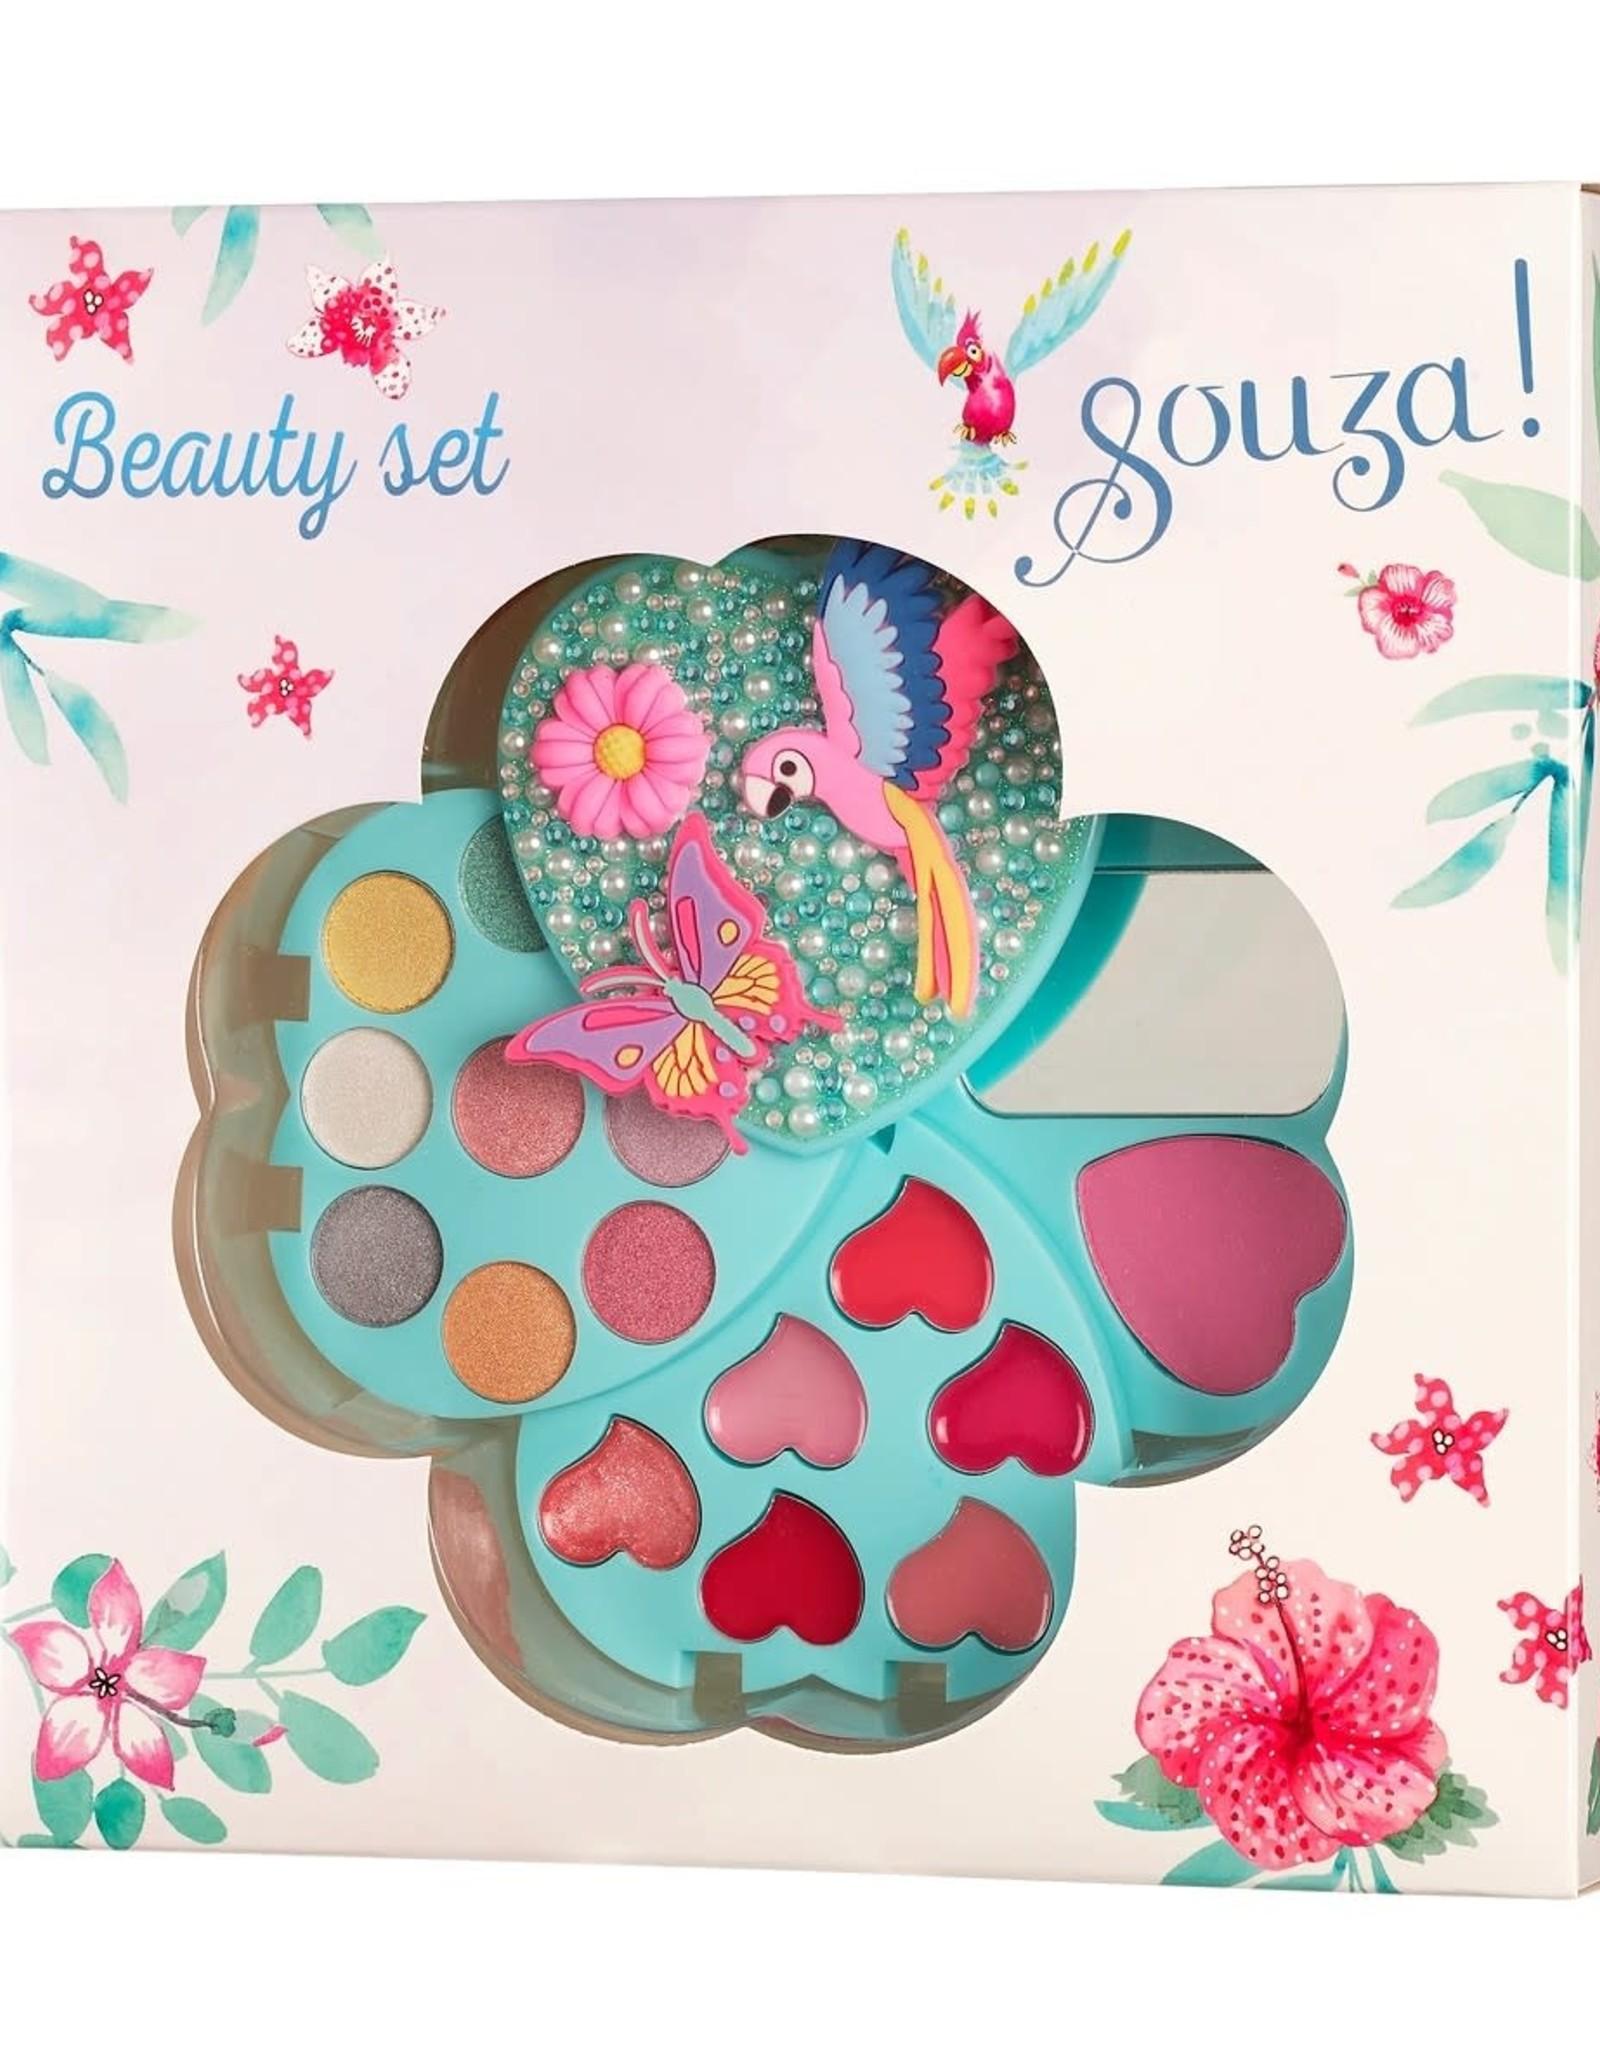 Souza! Luxe Beauty Set - Souza!